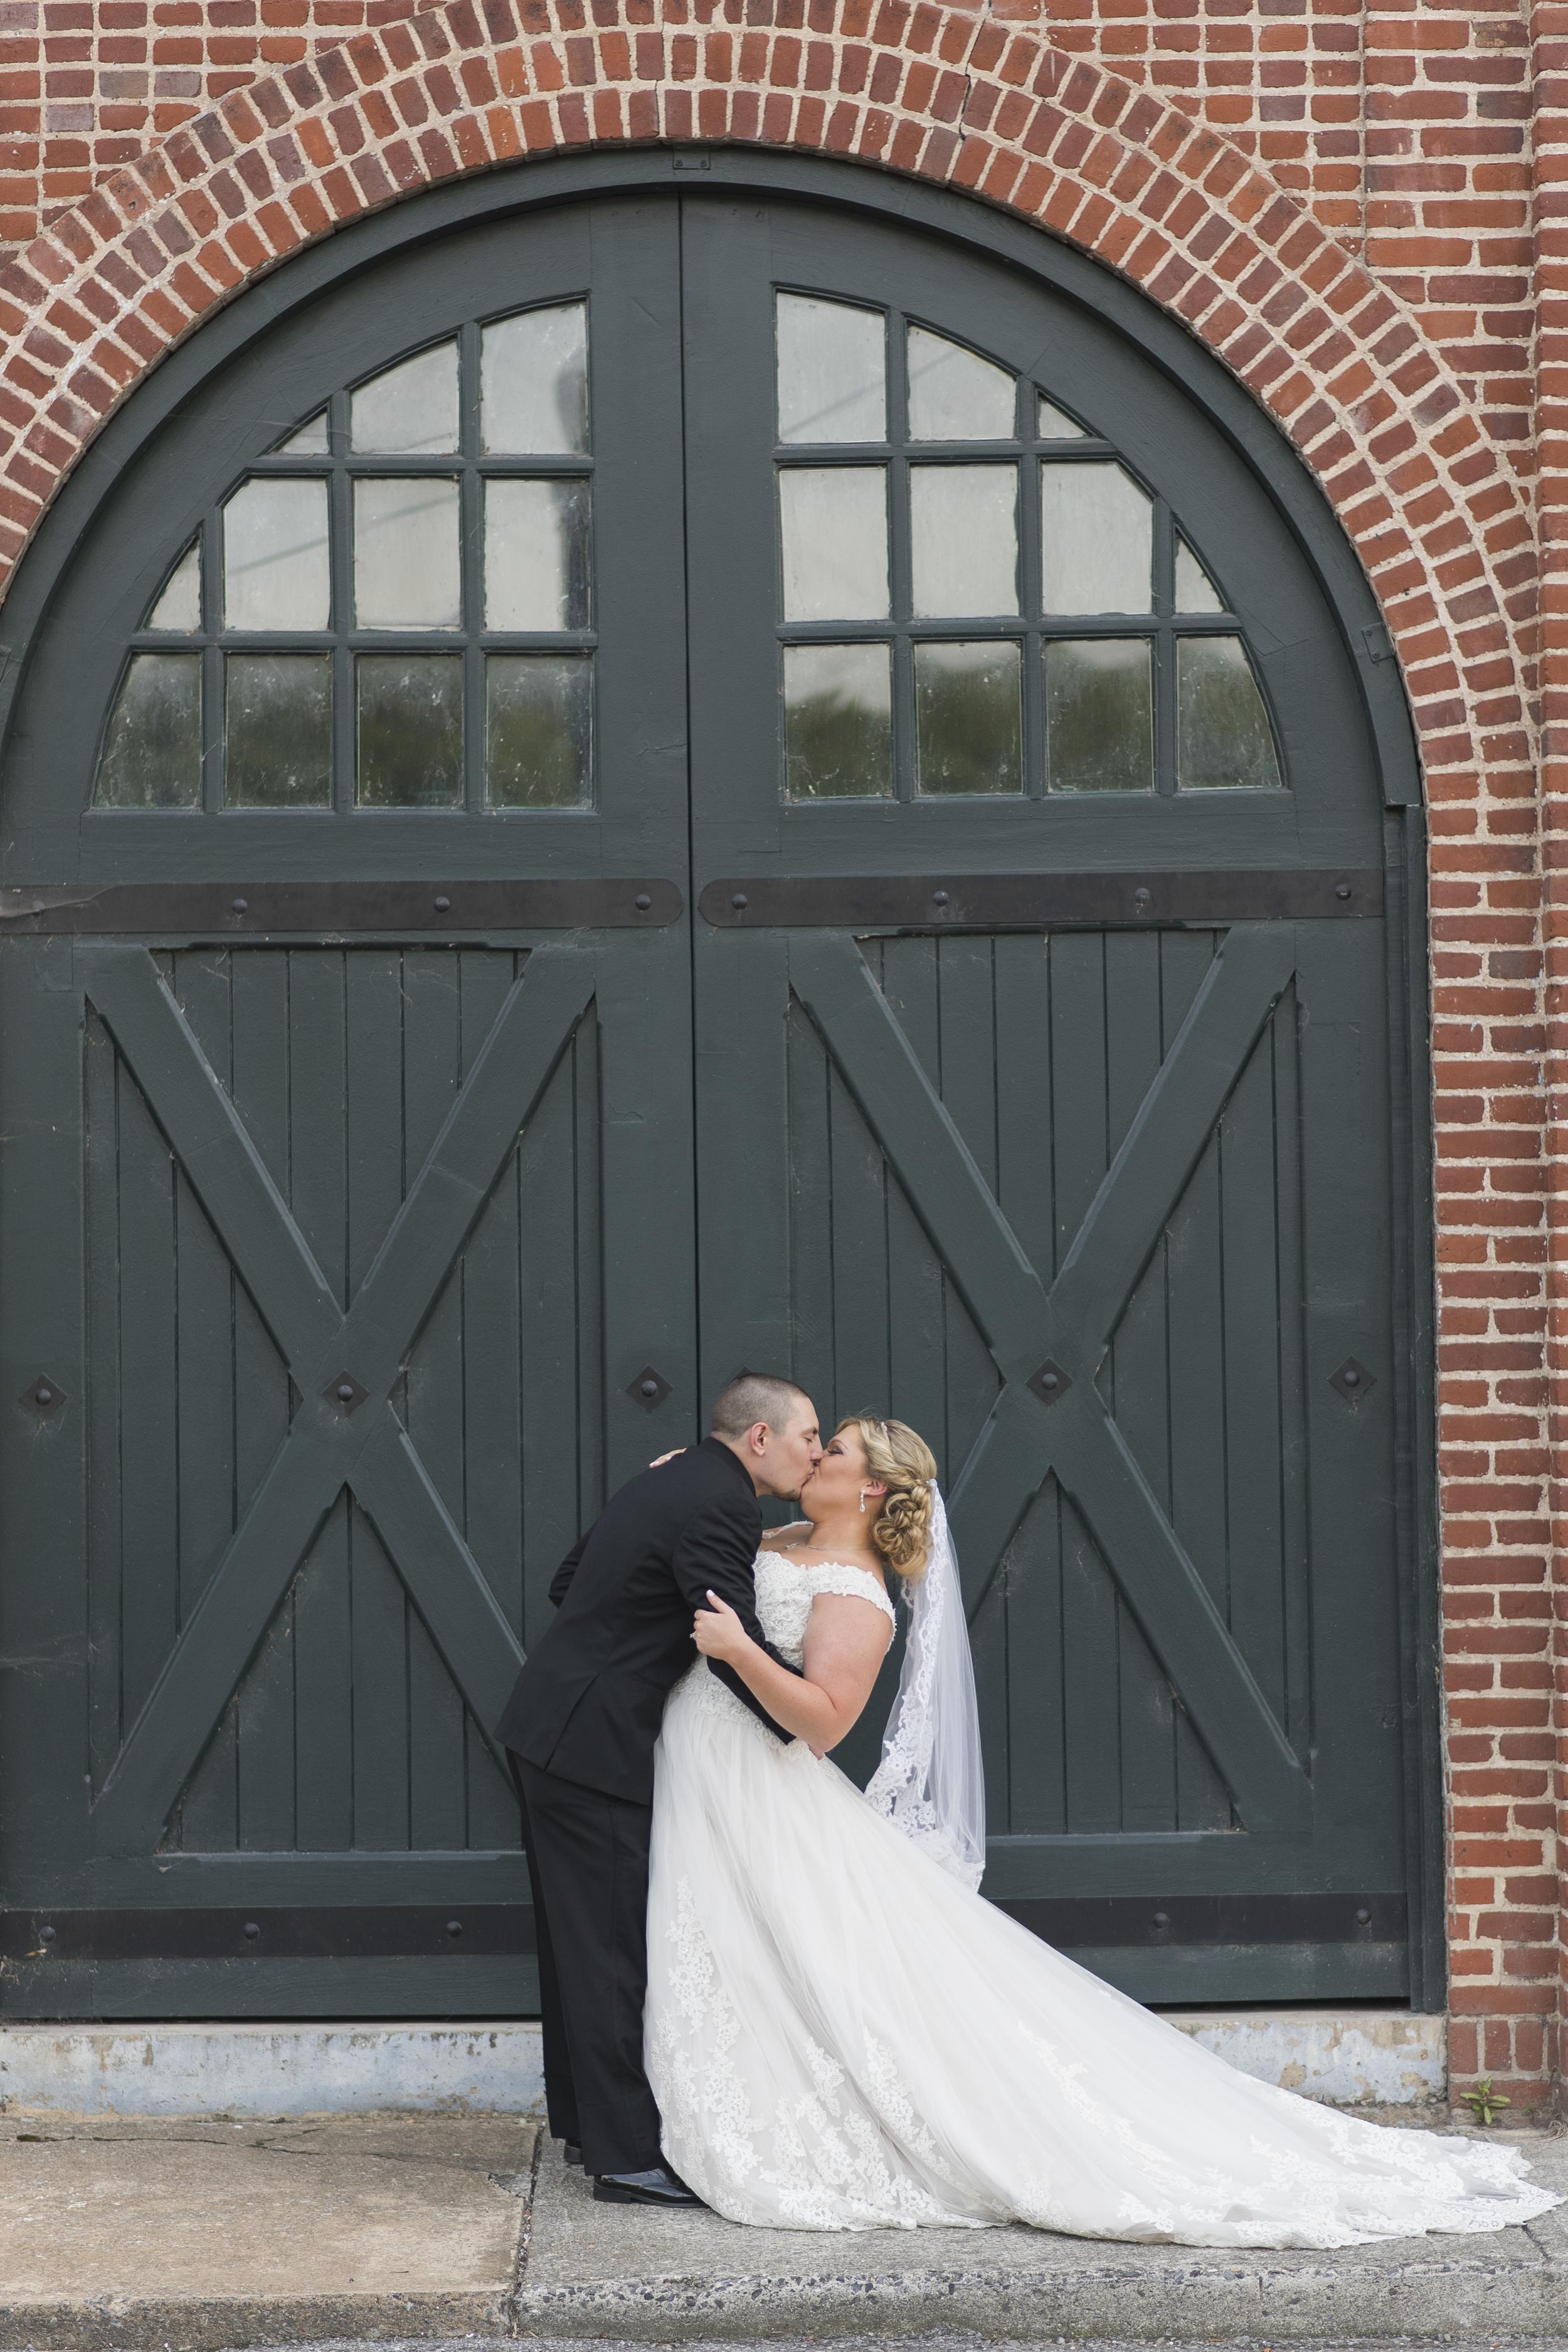 Lynchburg_VA_Wedding_Tresca on 8th_Downtown_Purple_elegant_Photos905.jpg